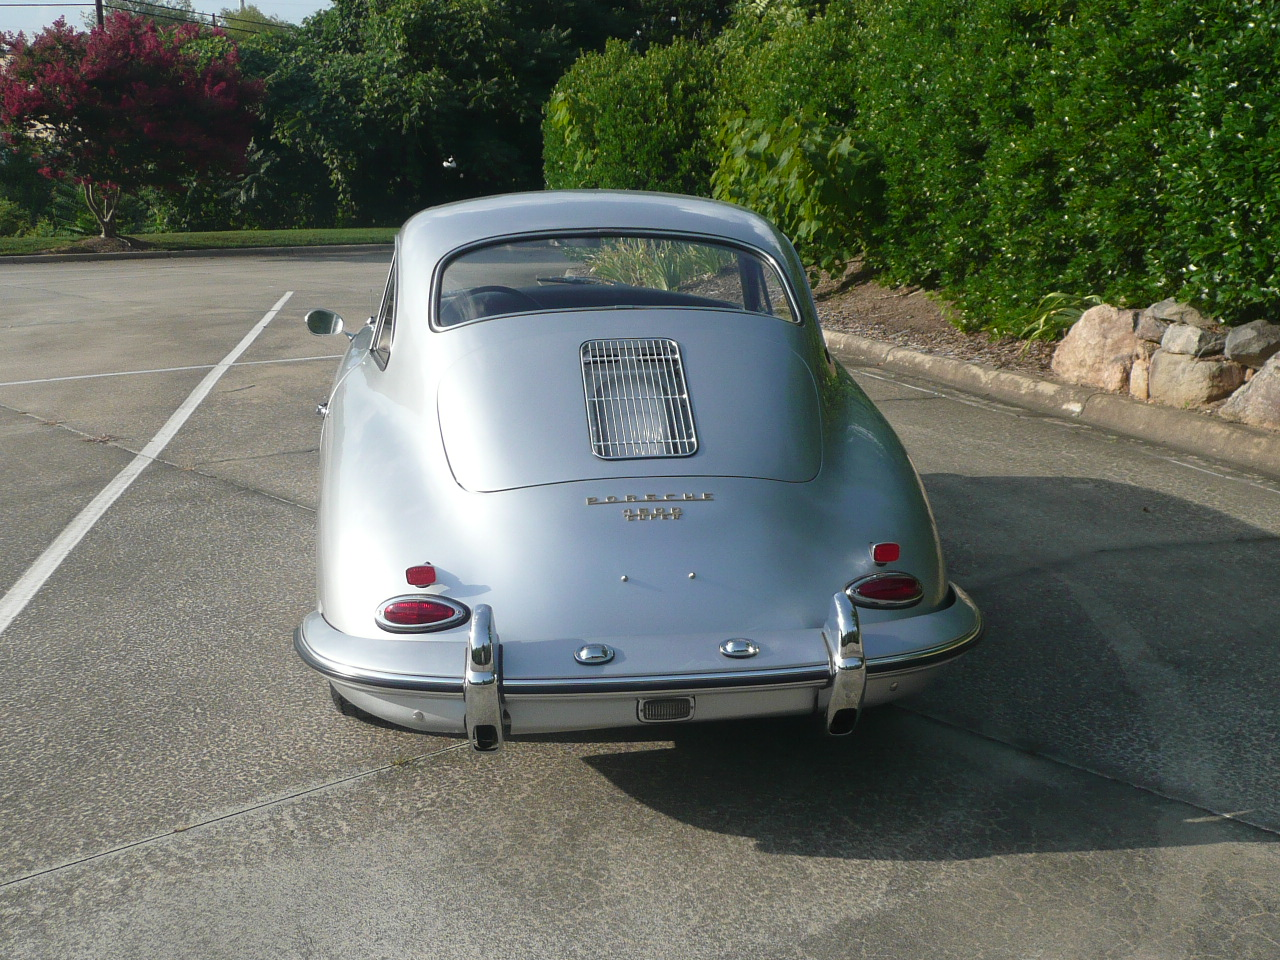 1960 Sunroof Super (75)